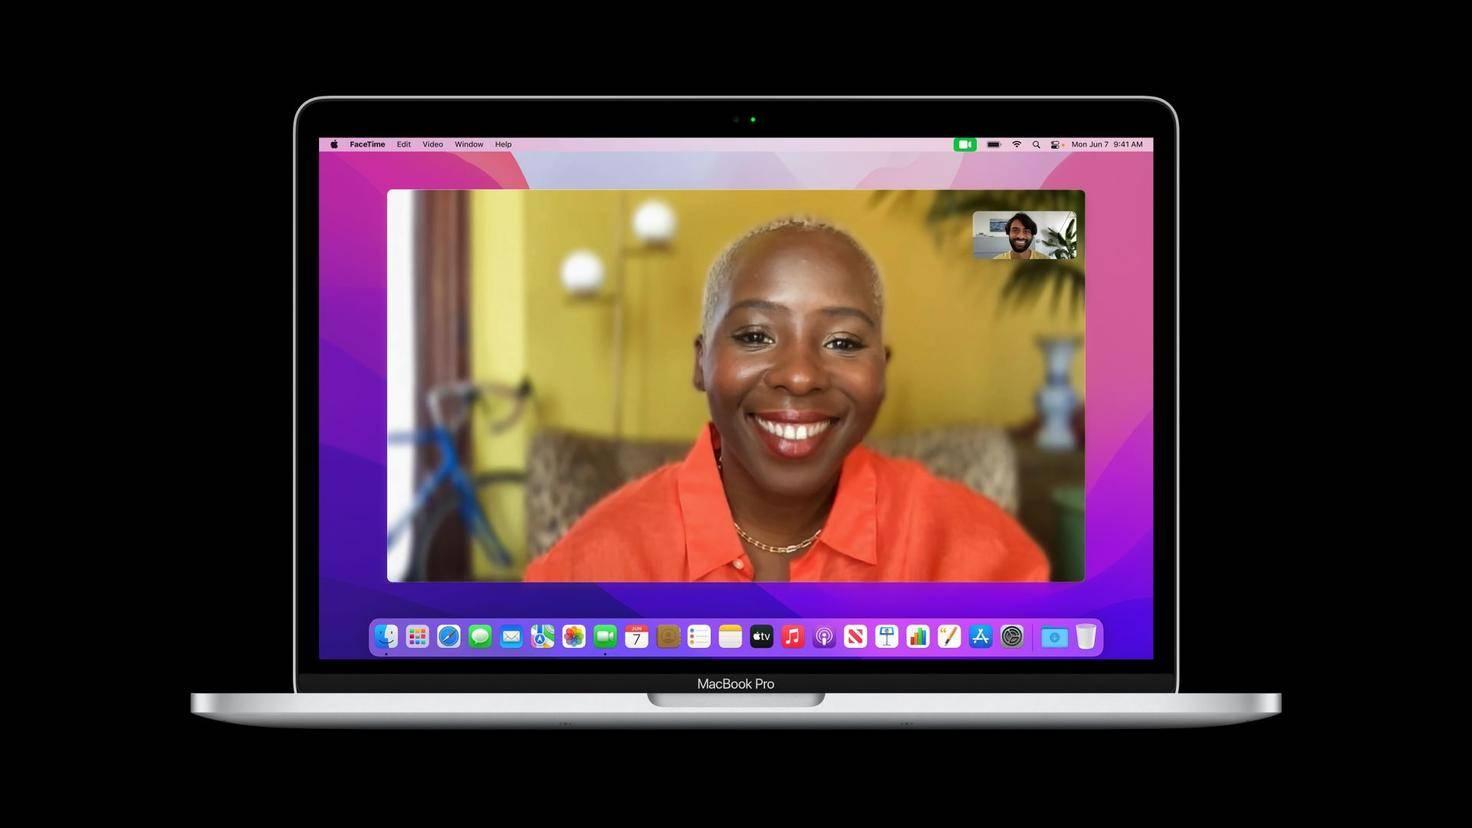 macOS-Monterey-MacBookPro-FaceTime-Portrait-mode_screen-full-hd